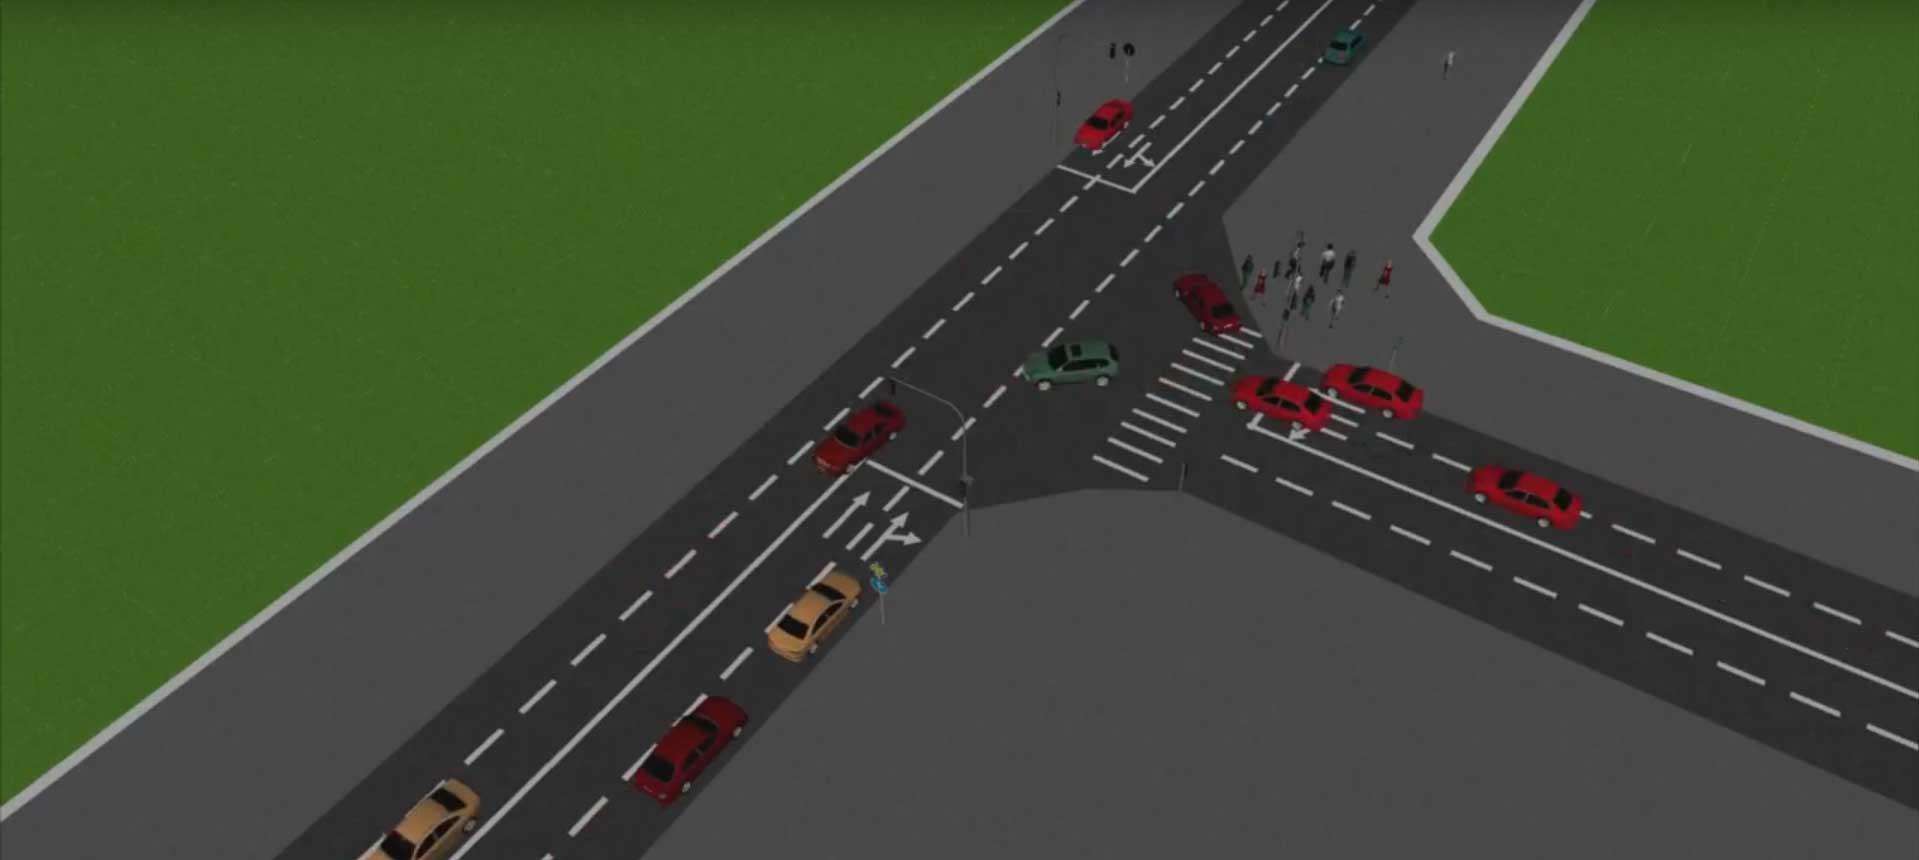 Road Traffic Simulation Software – AnyLogic Simulation Software